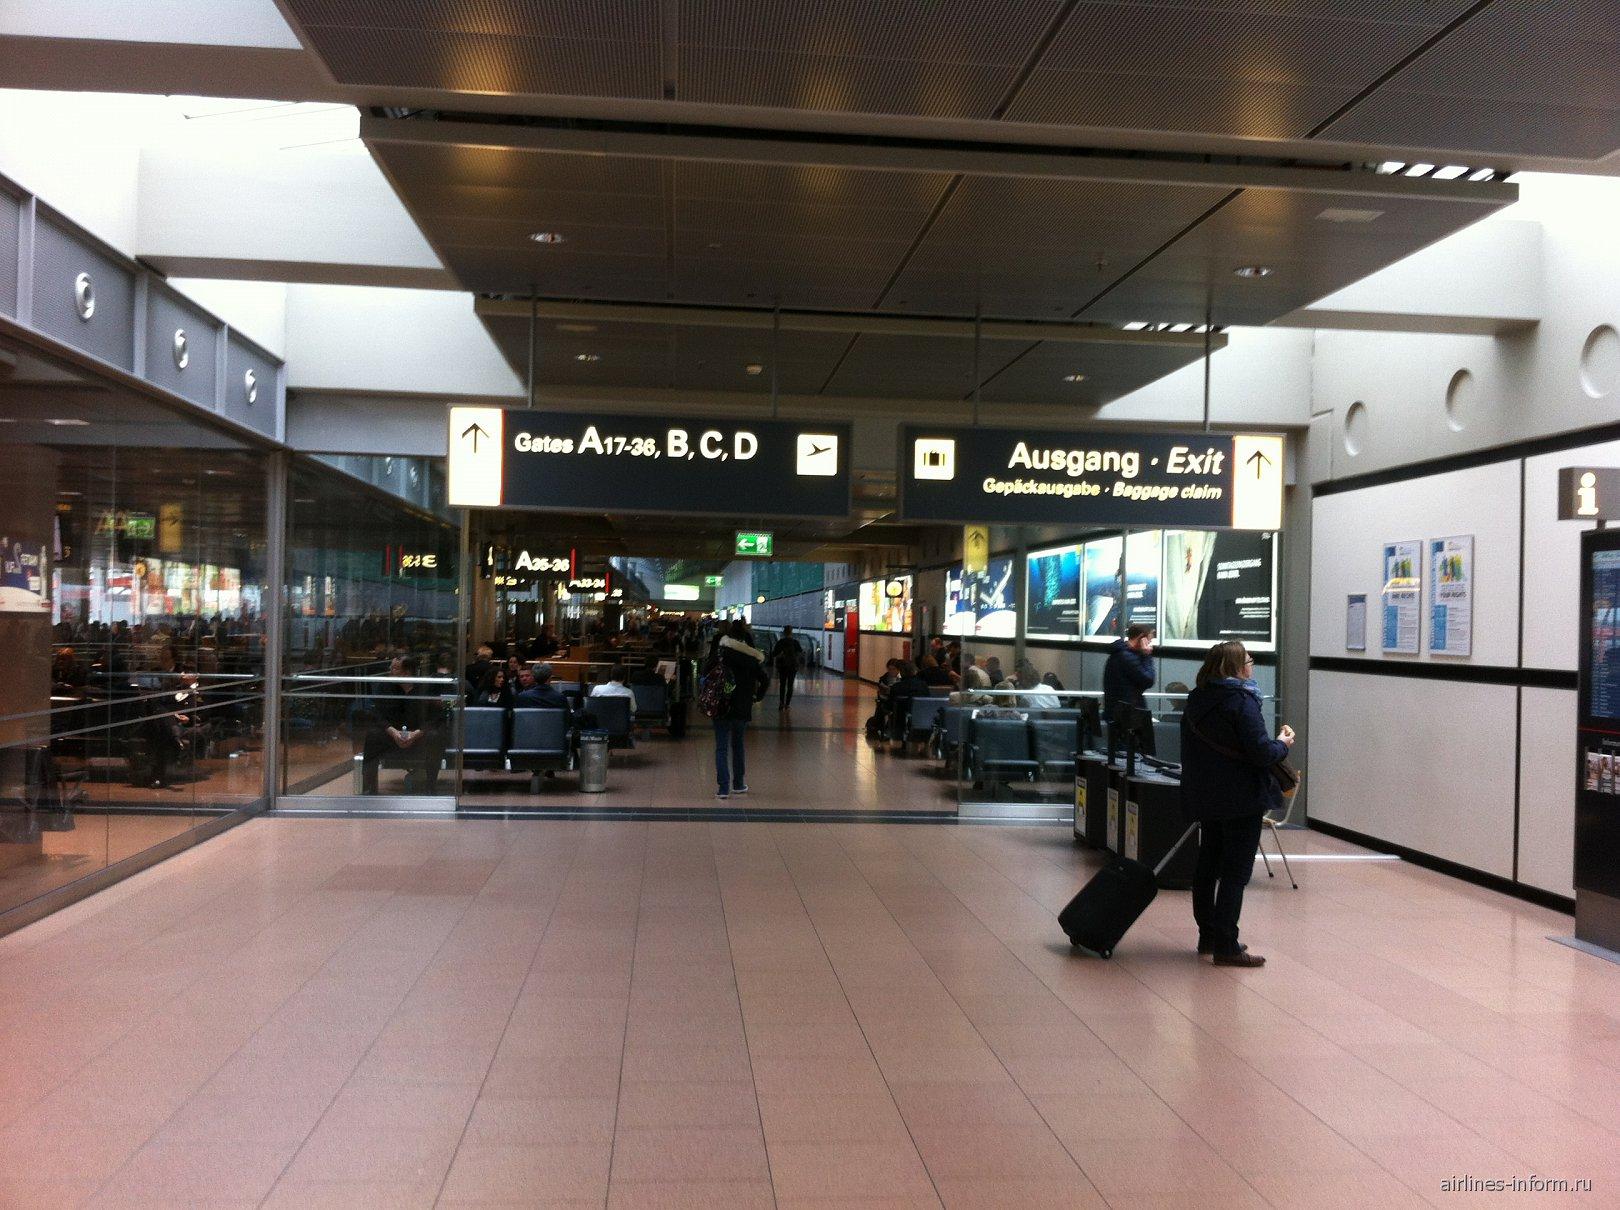 Зона вылета в аэропорту Гамбург